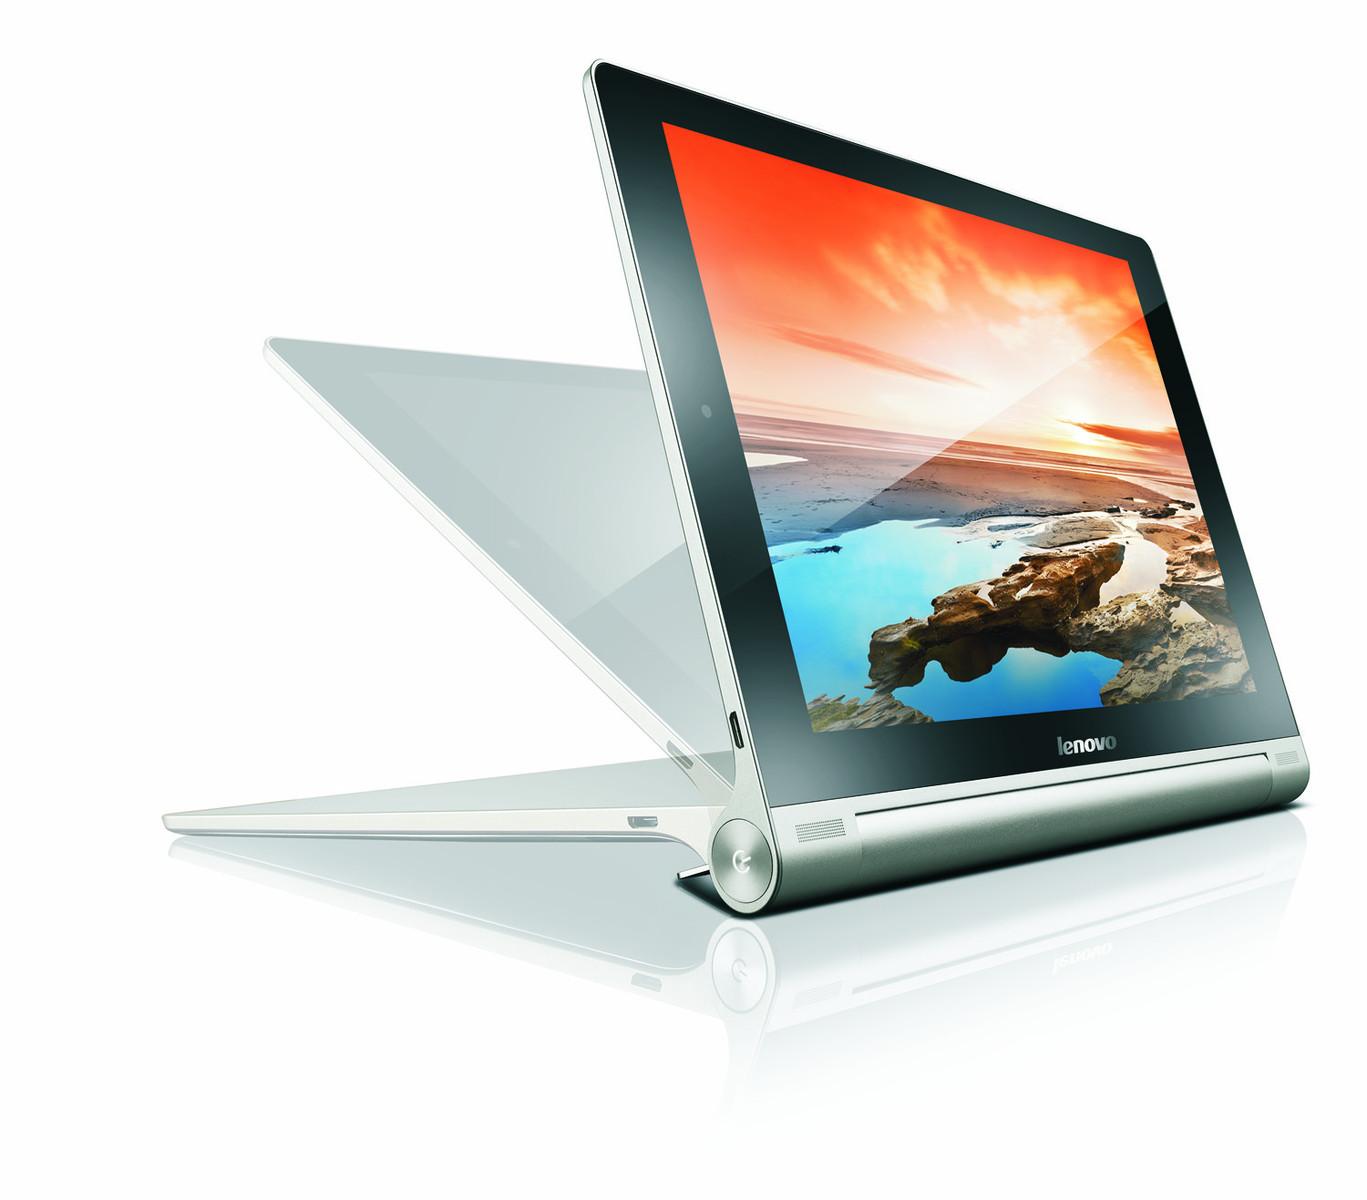 Lenovo Yoga Tablet 10 Hd External Reviews Homemade Laptop Wifi Amplifier Review Notebookreviewcom